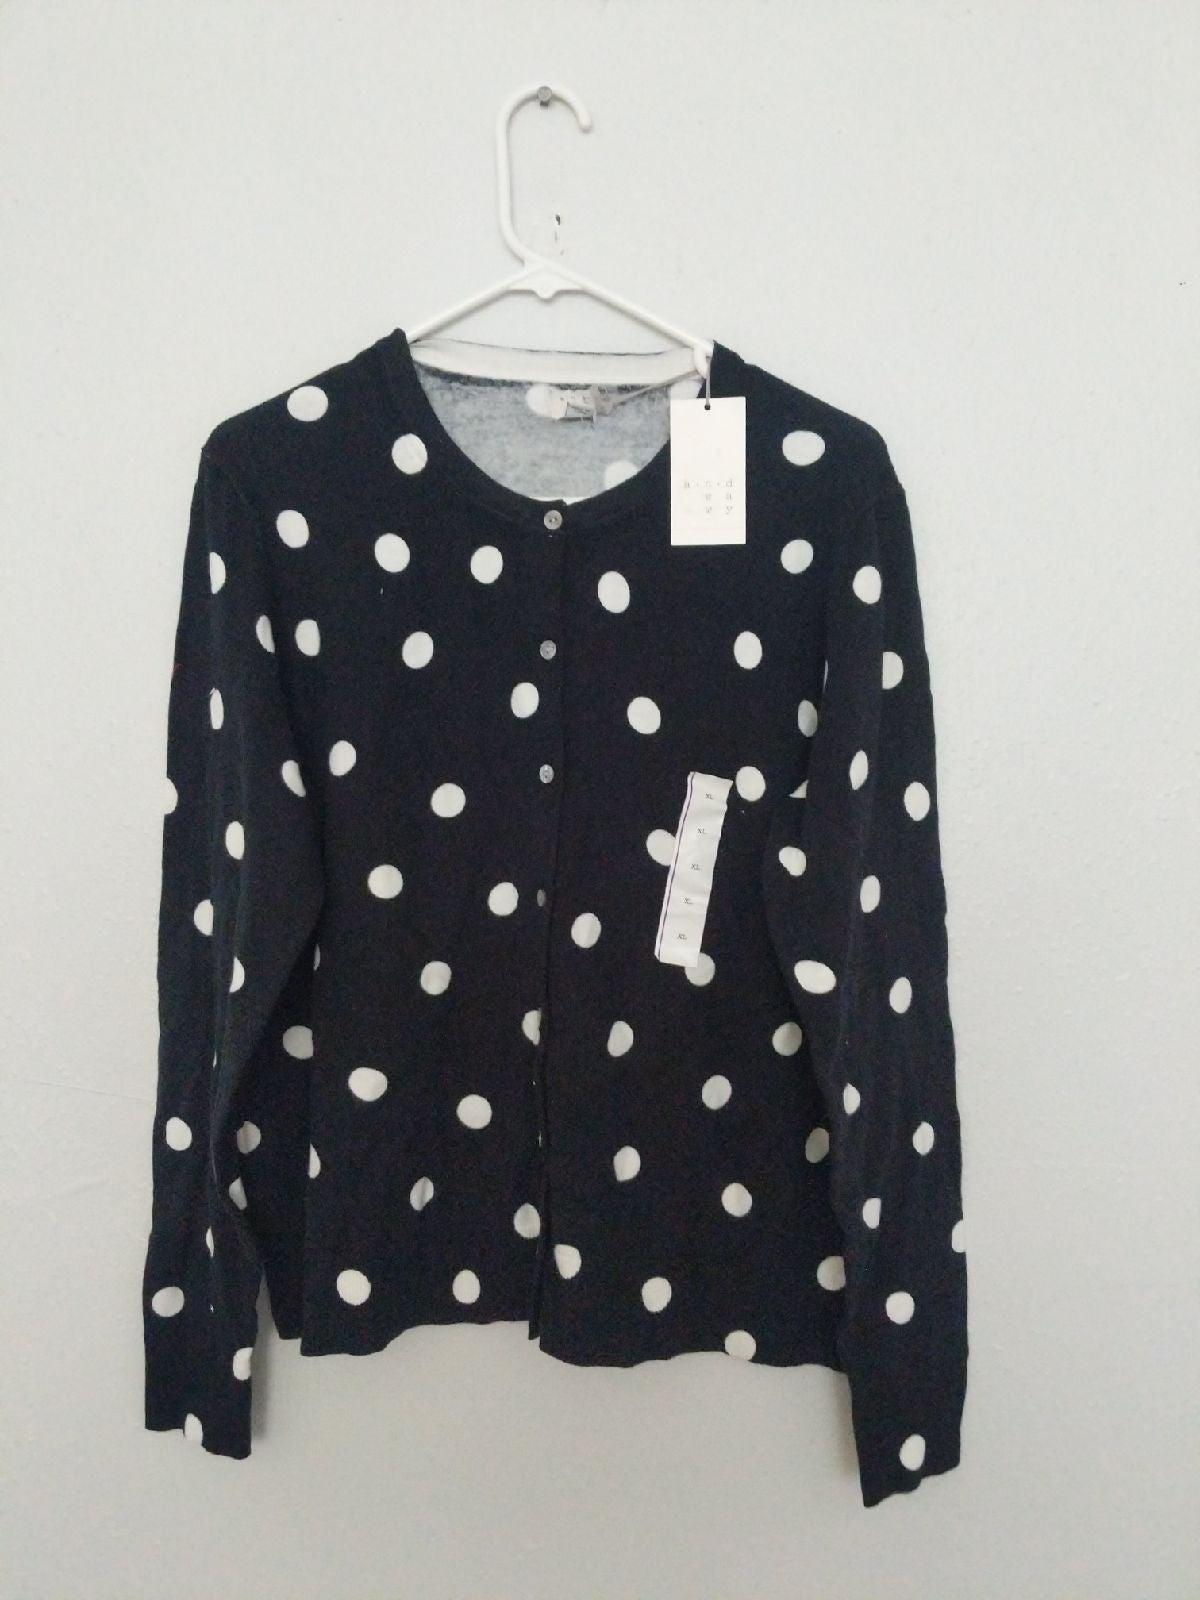 A New Day women's polka dot Cardigan